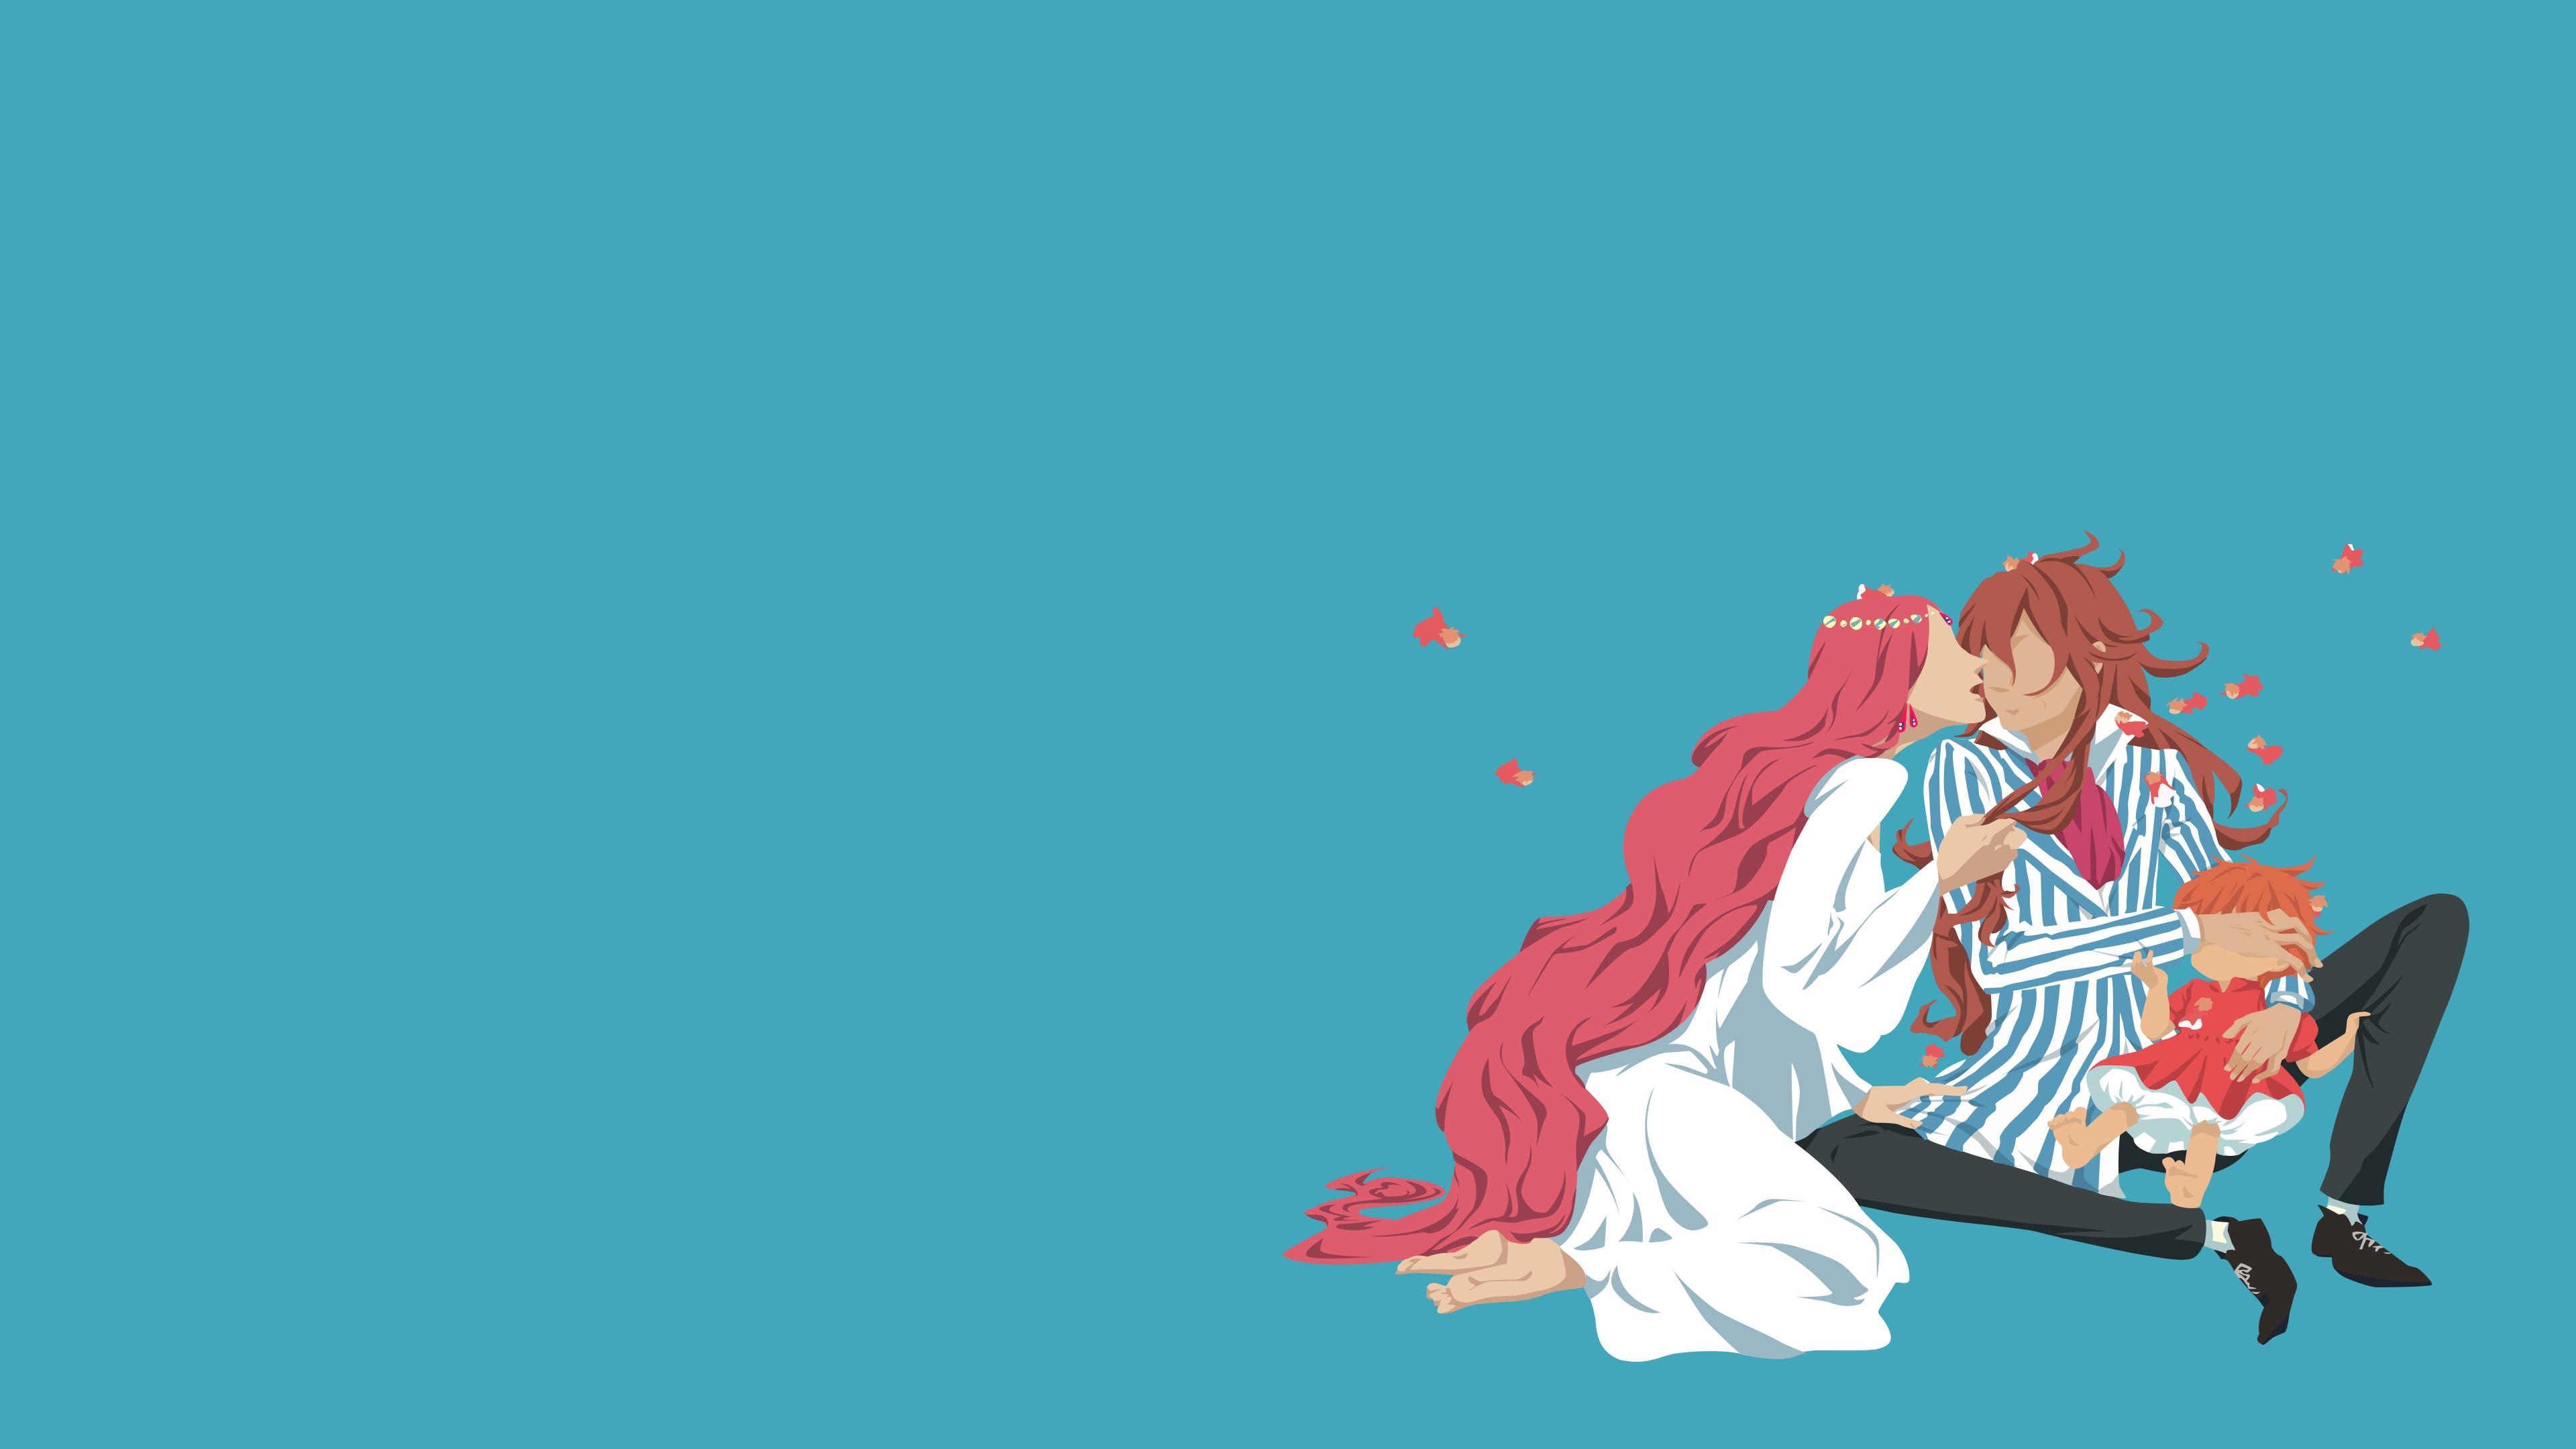 Anime Ponyo 3840x2160